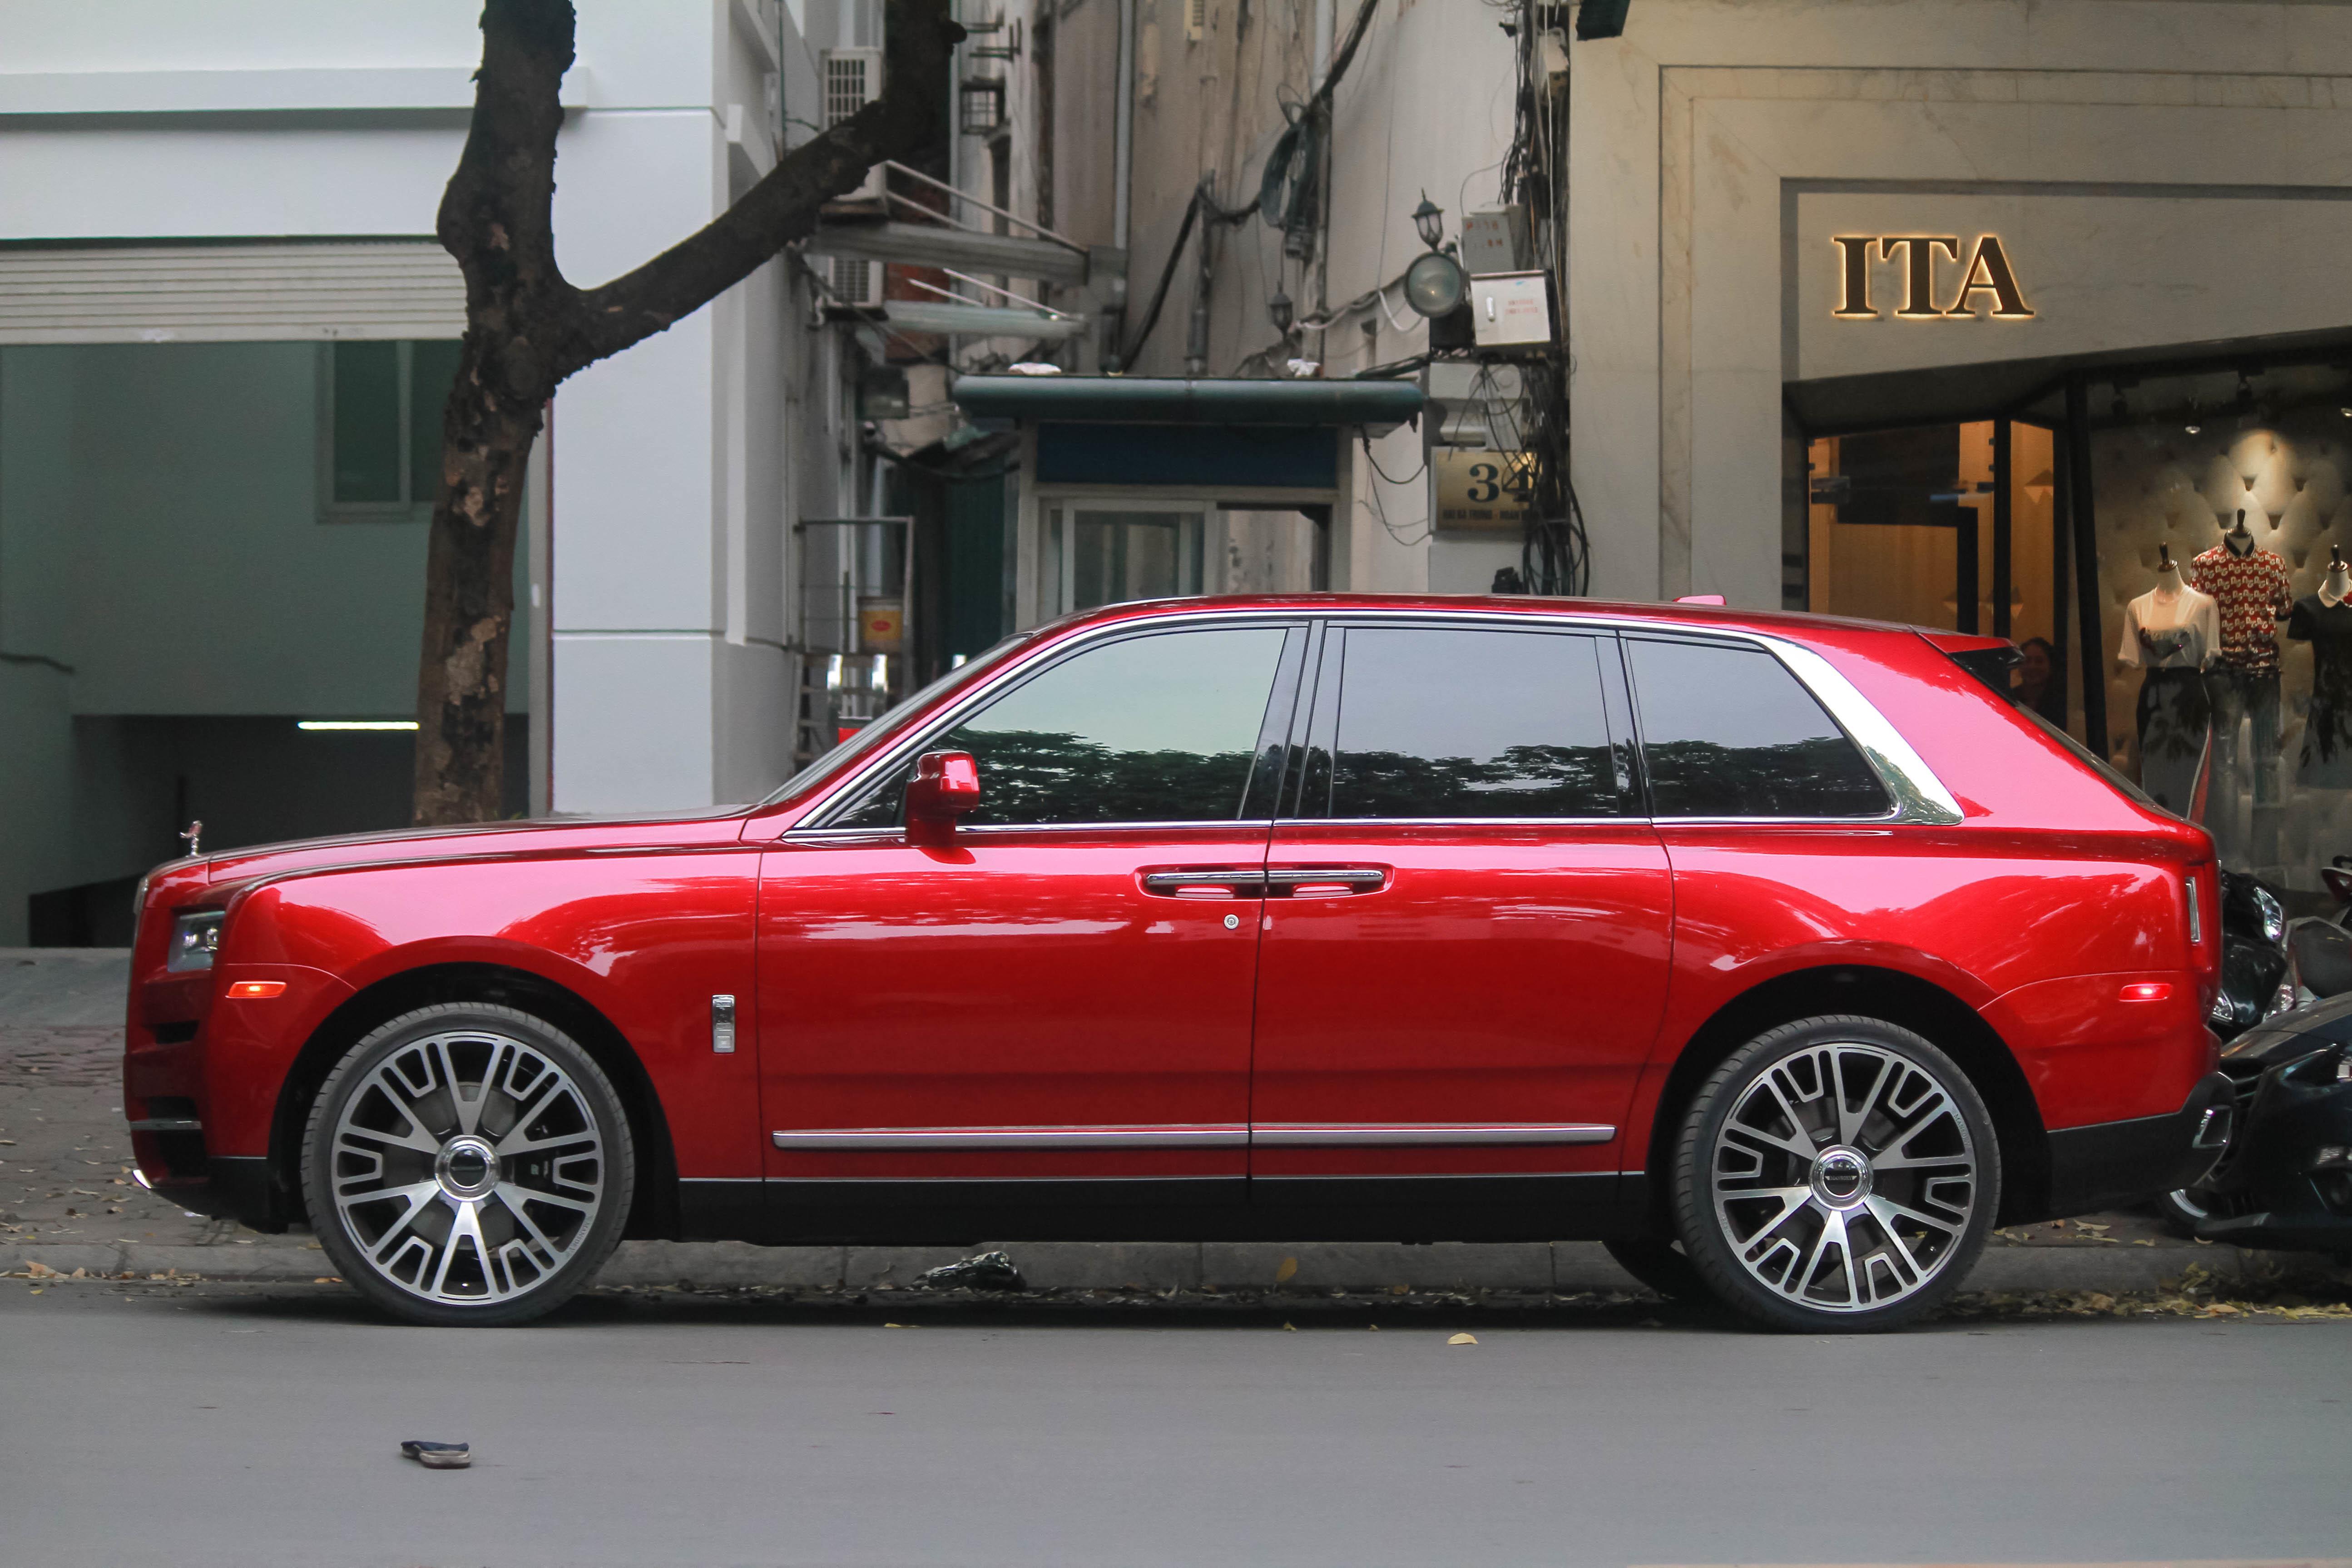 Bo doi SUV sieu sang Rolls-Royce Cullinan lan dau 'dung do' tai Ha Noi hinh anh 5